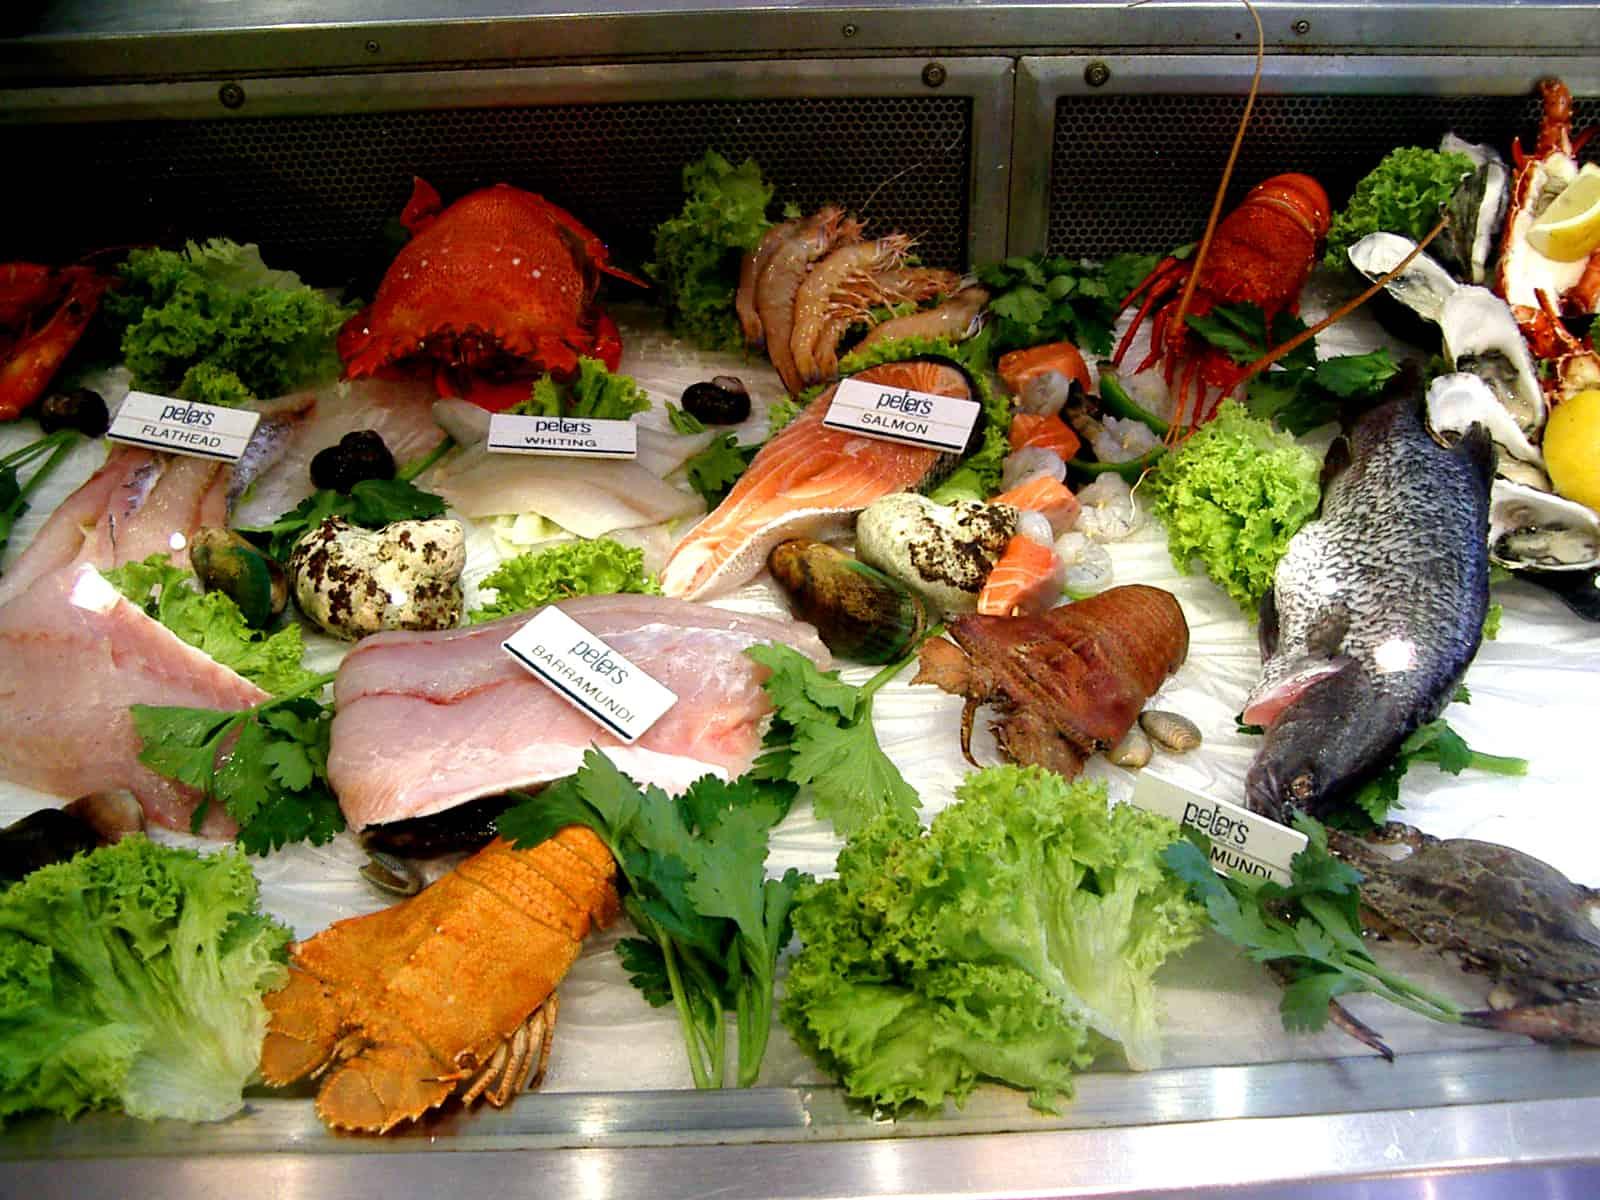 Kuchnia w Australii - owoce morza